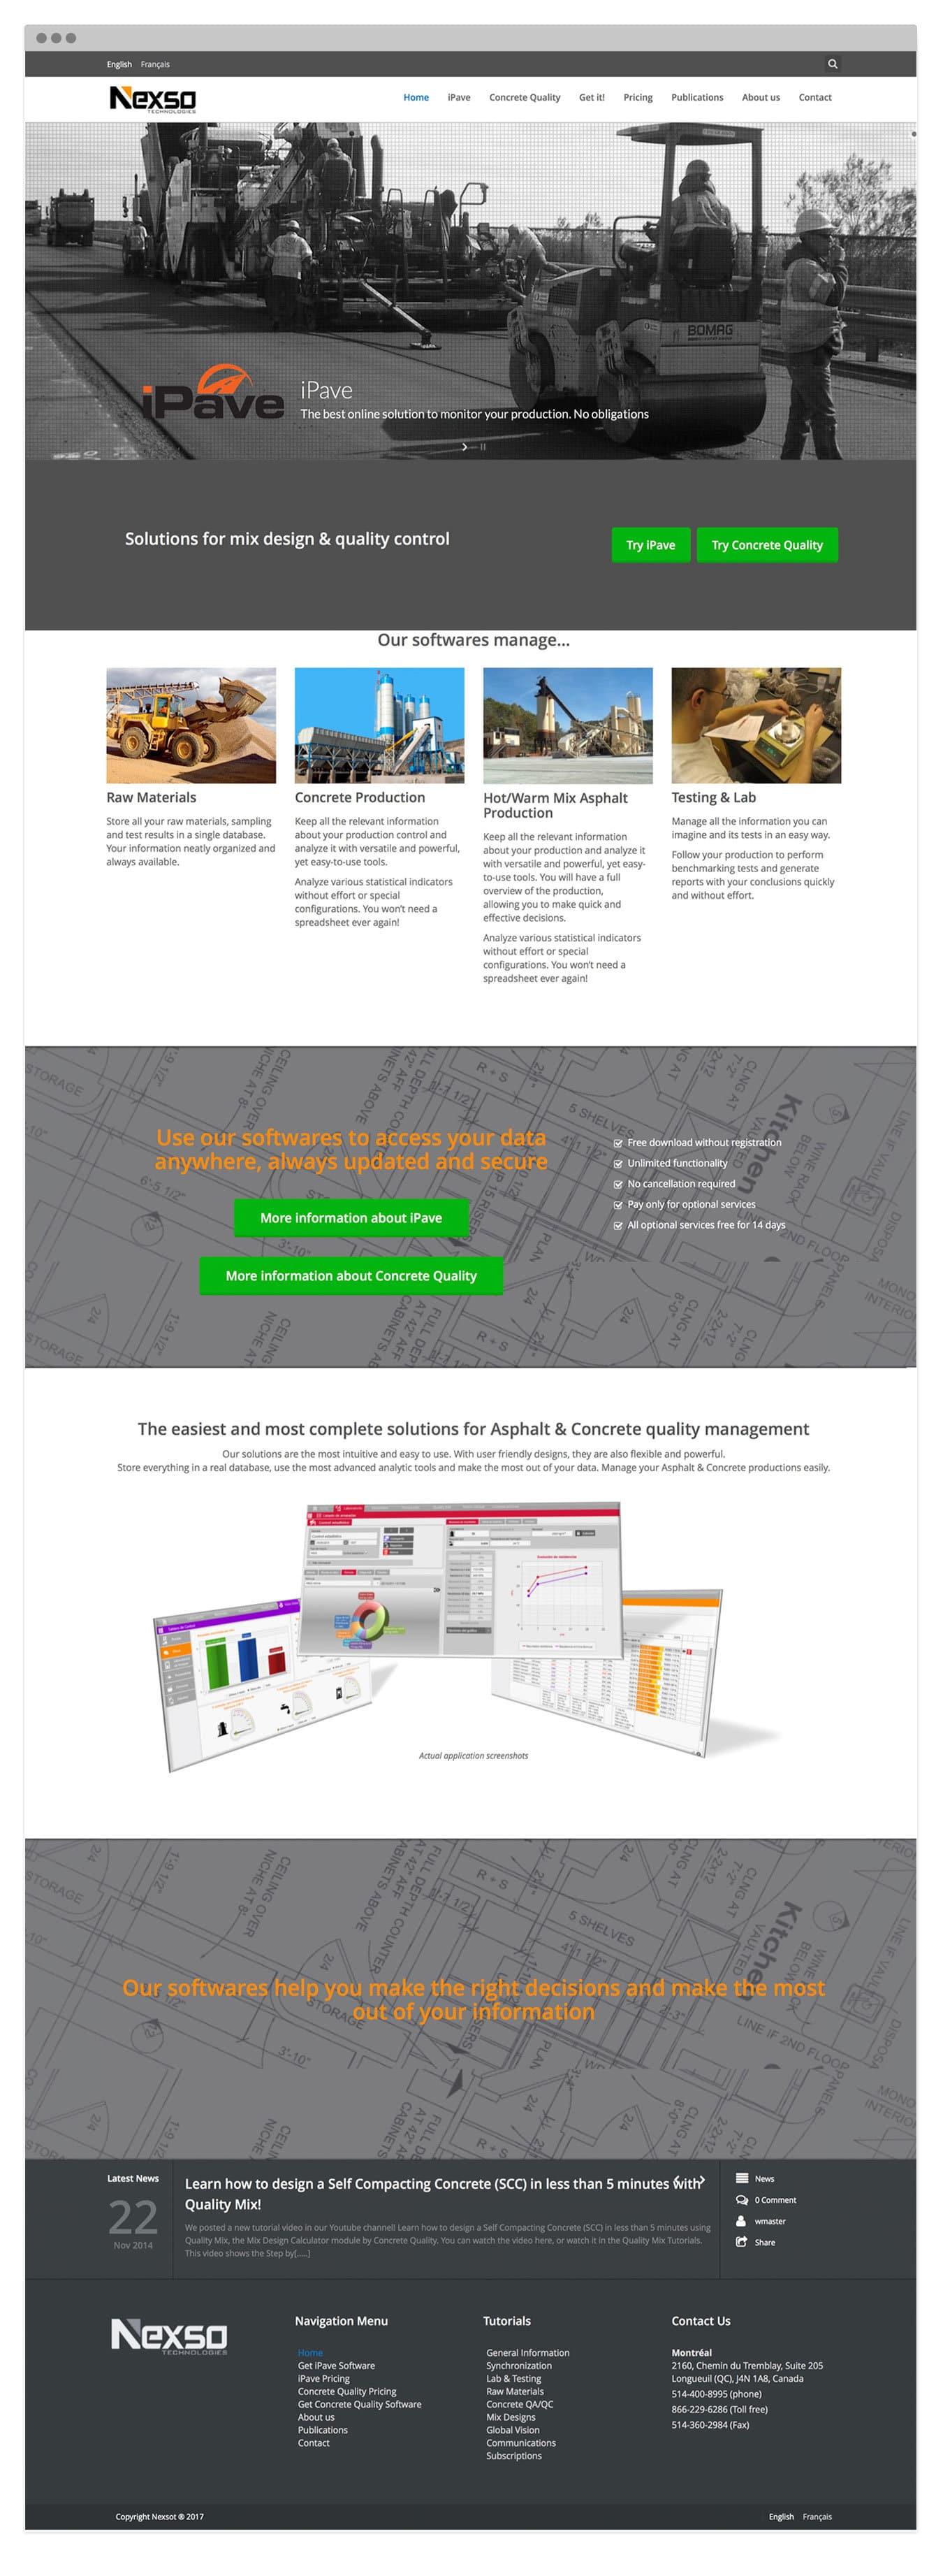 Diseño de pagina Web Wordpress para Nexso